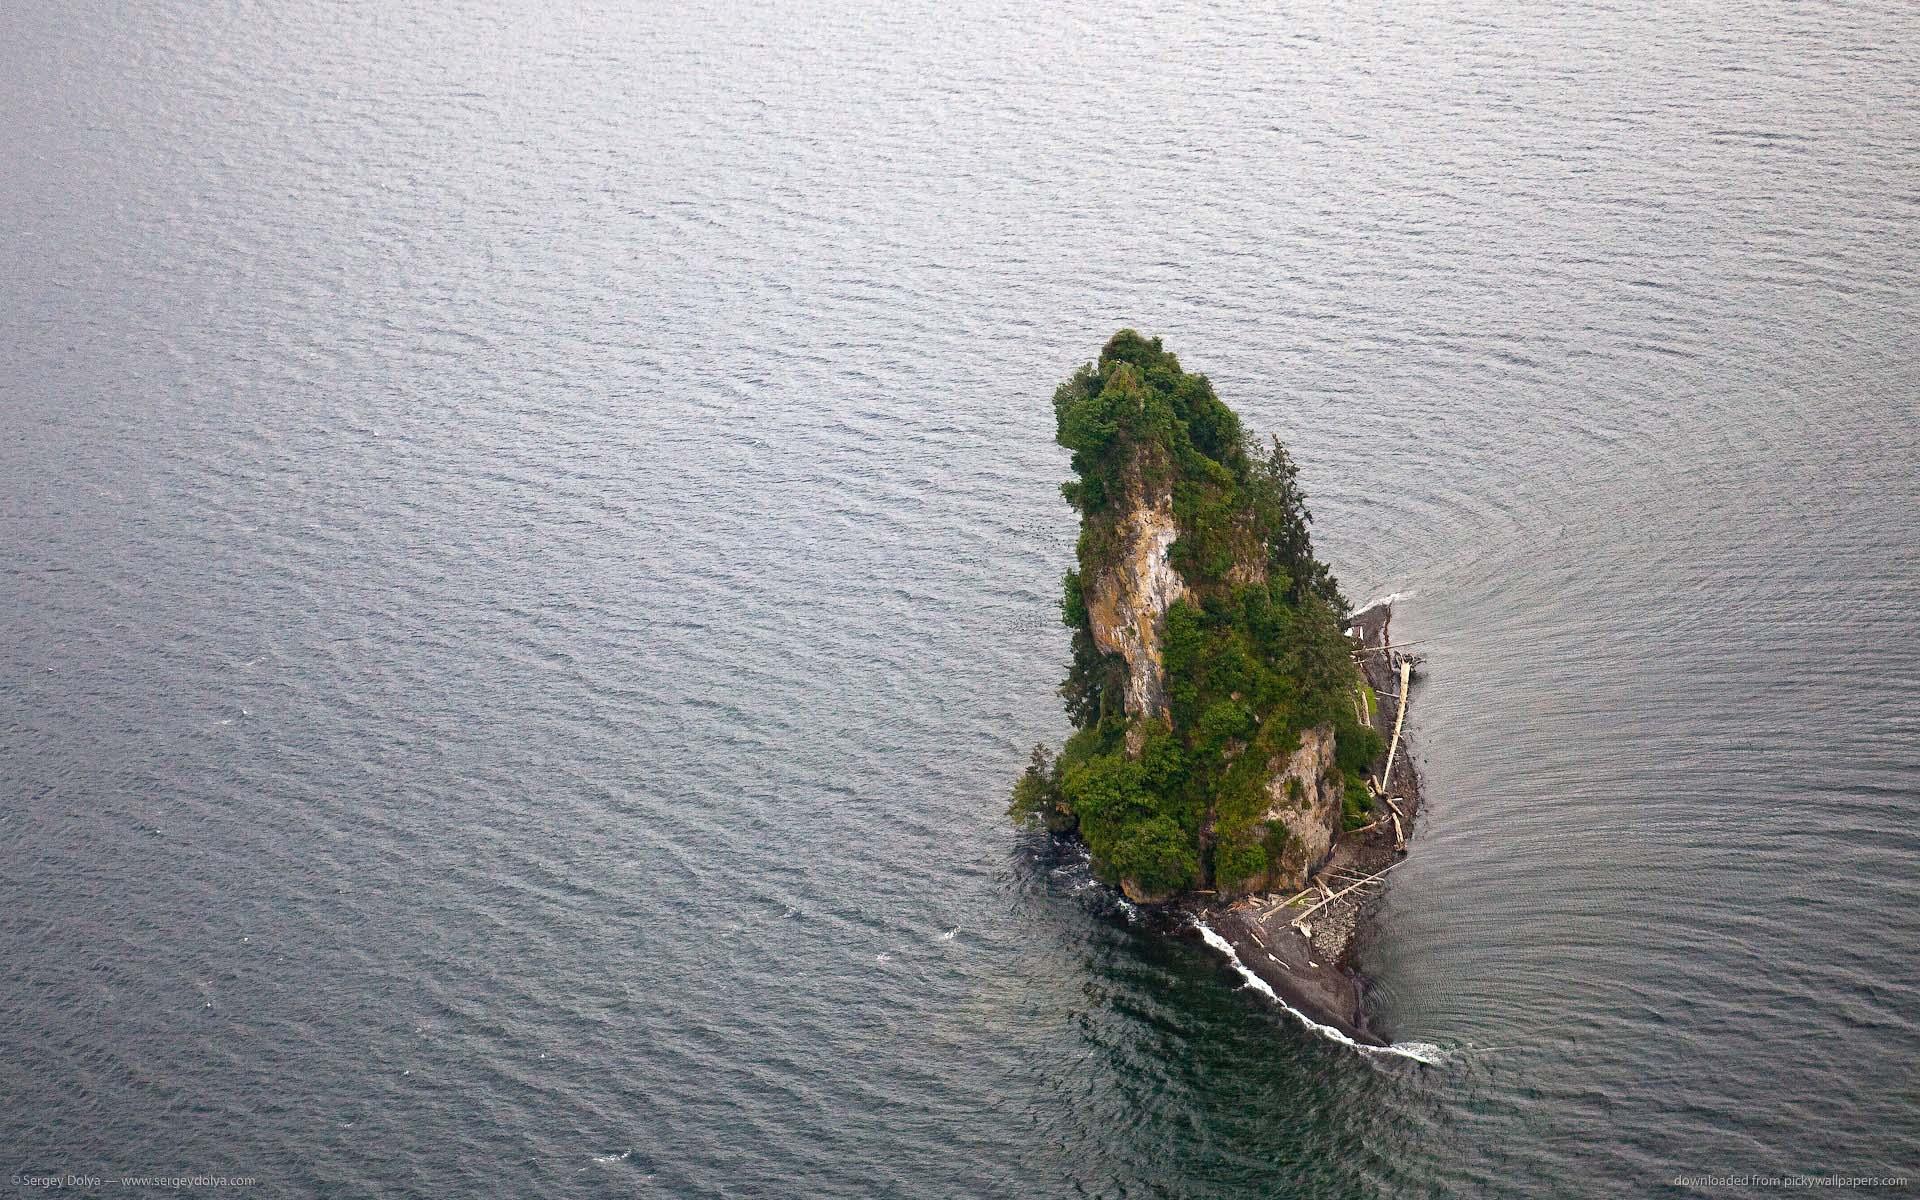 Klassiker: En innsjø på en øy i en innsjø?